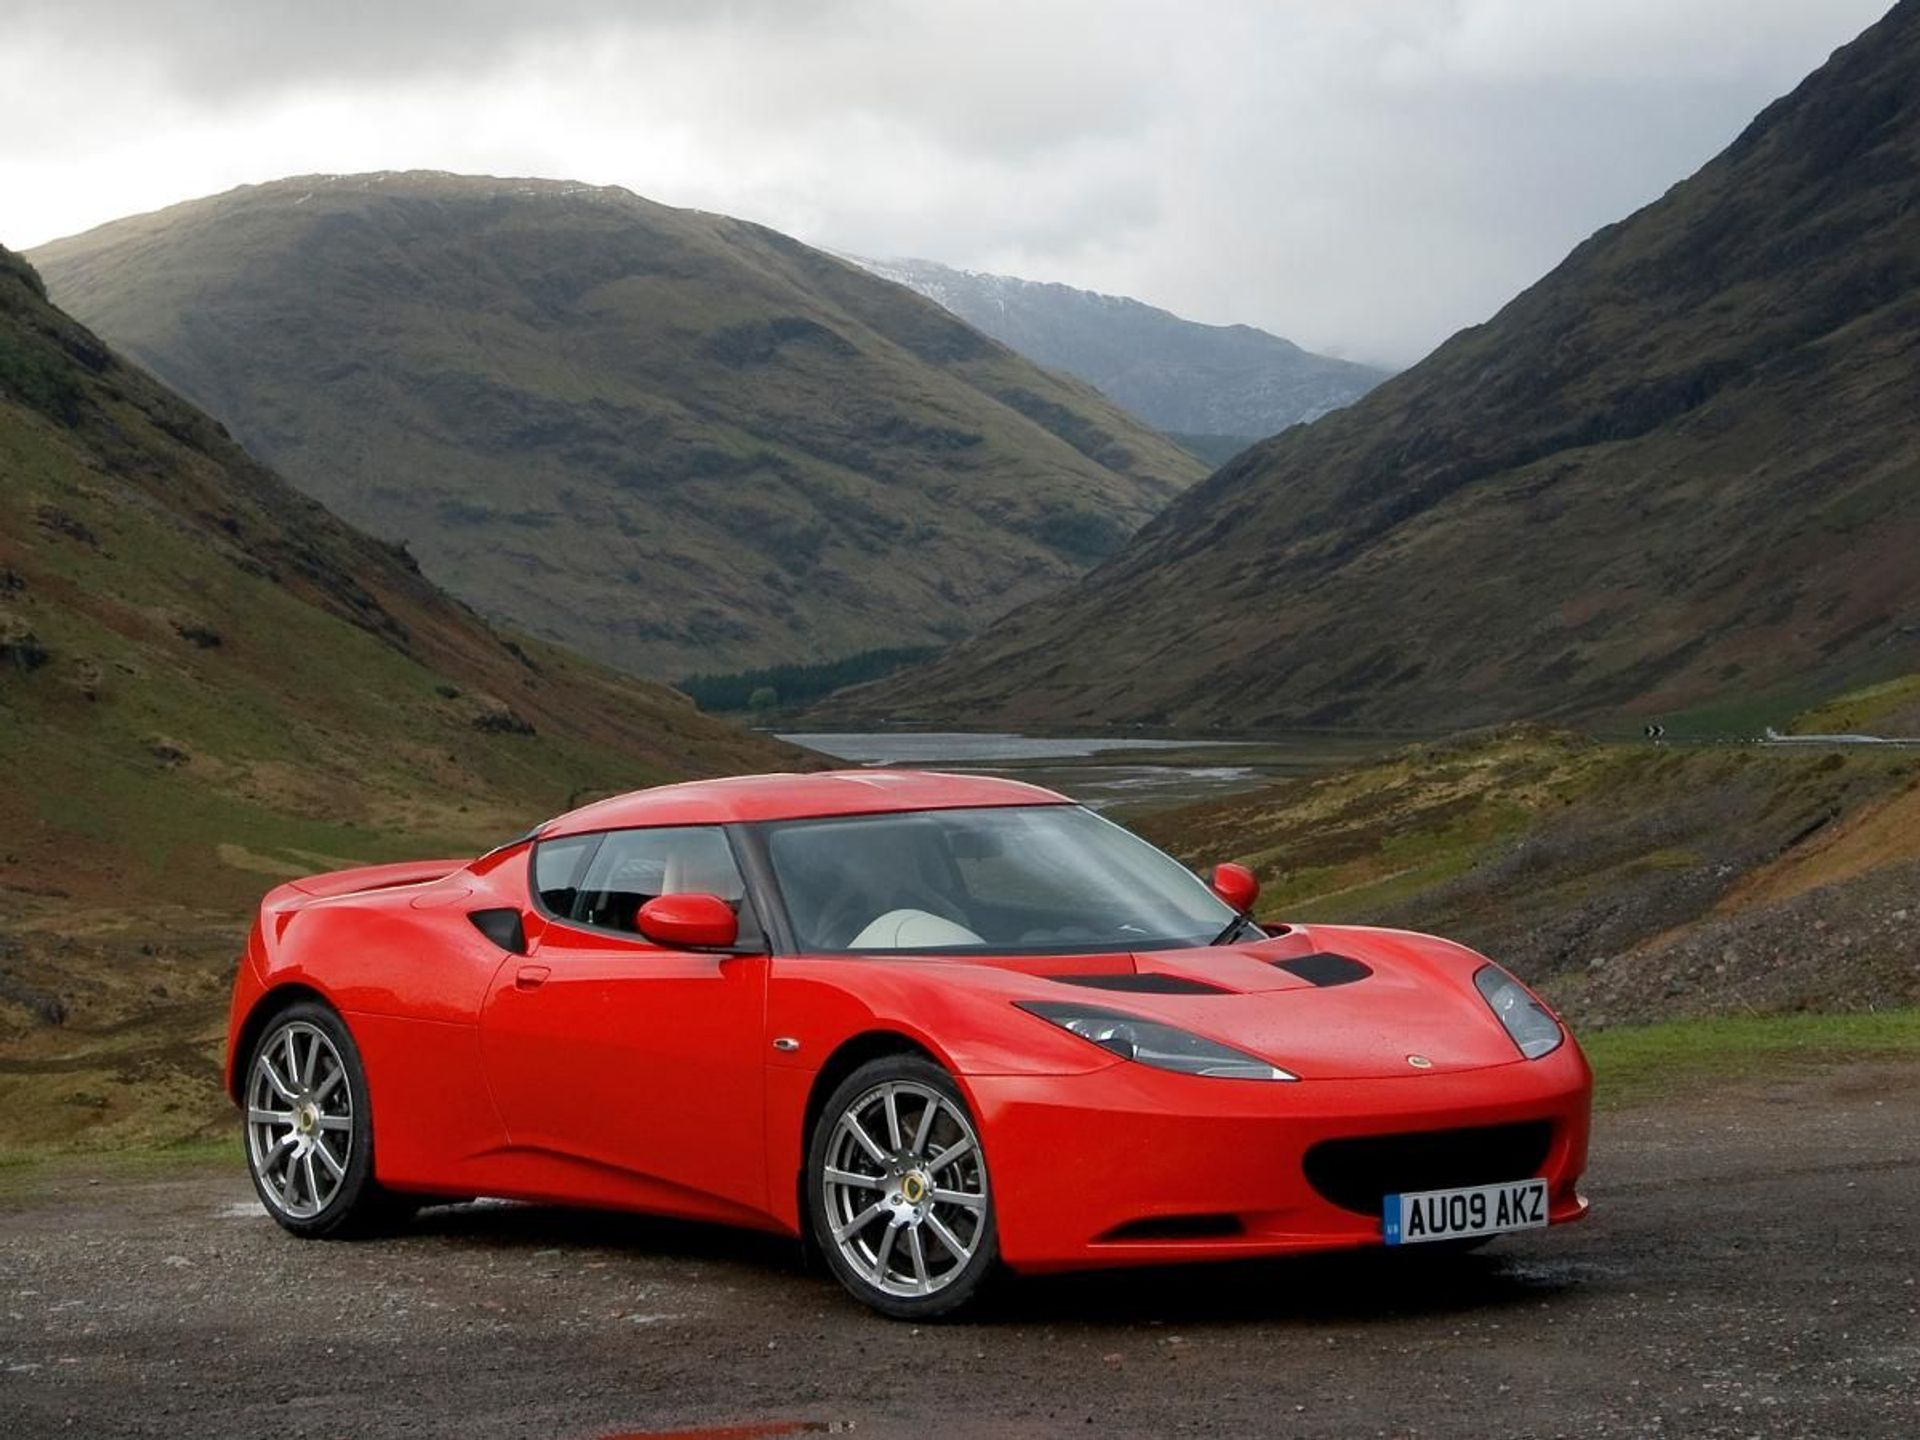 Lotus Evora GT430 image